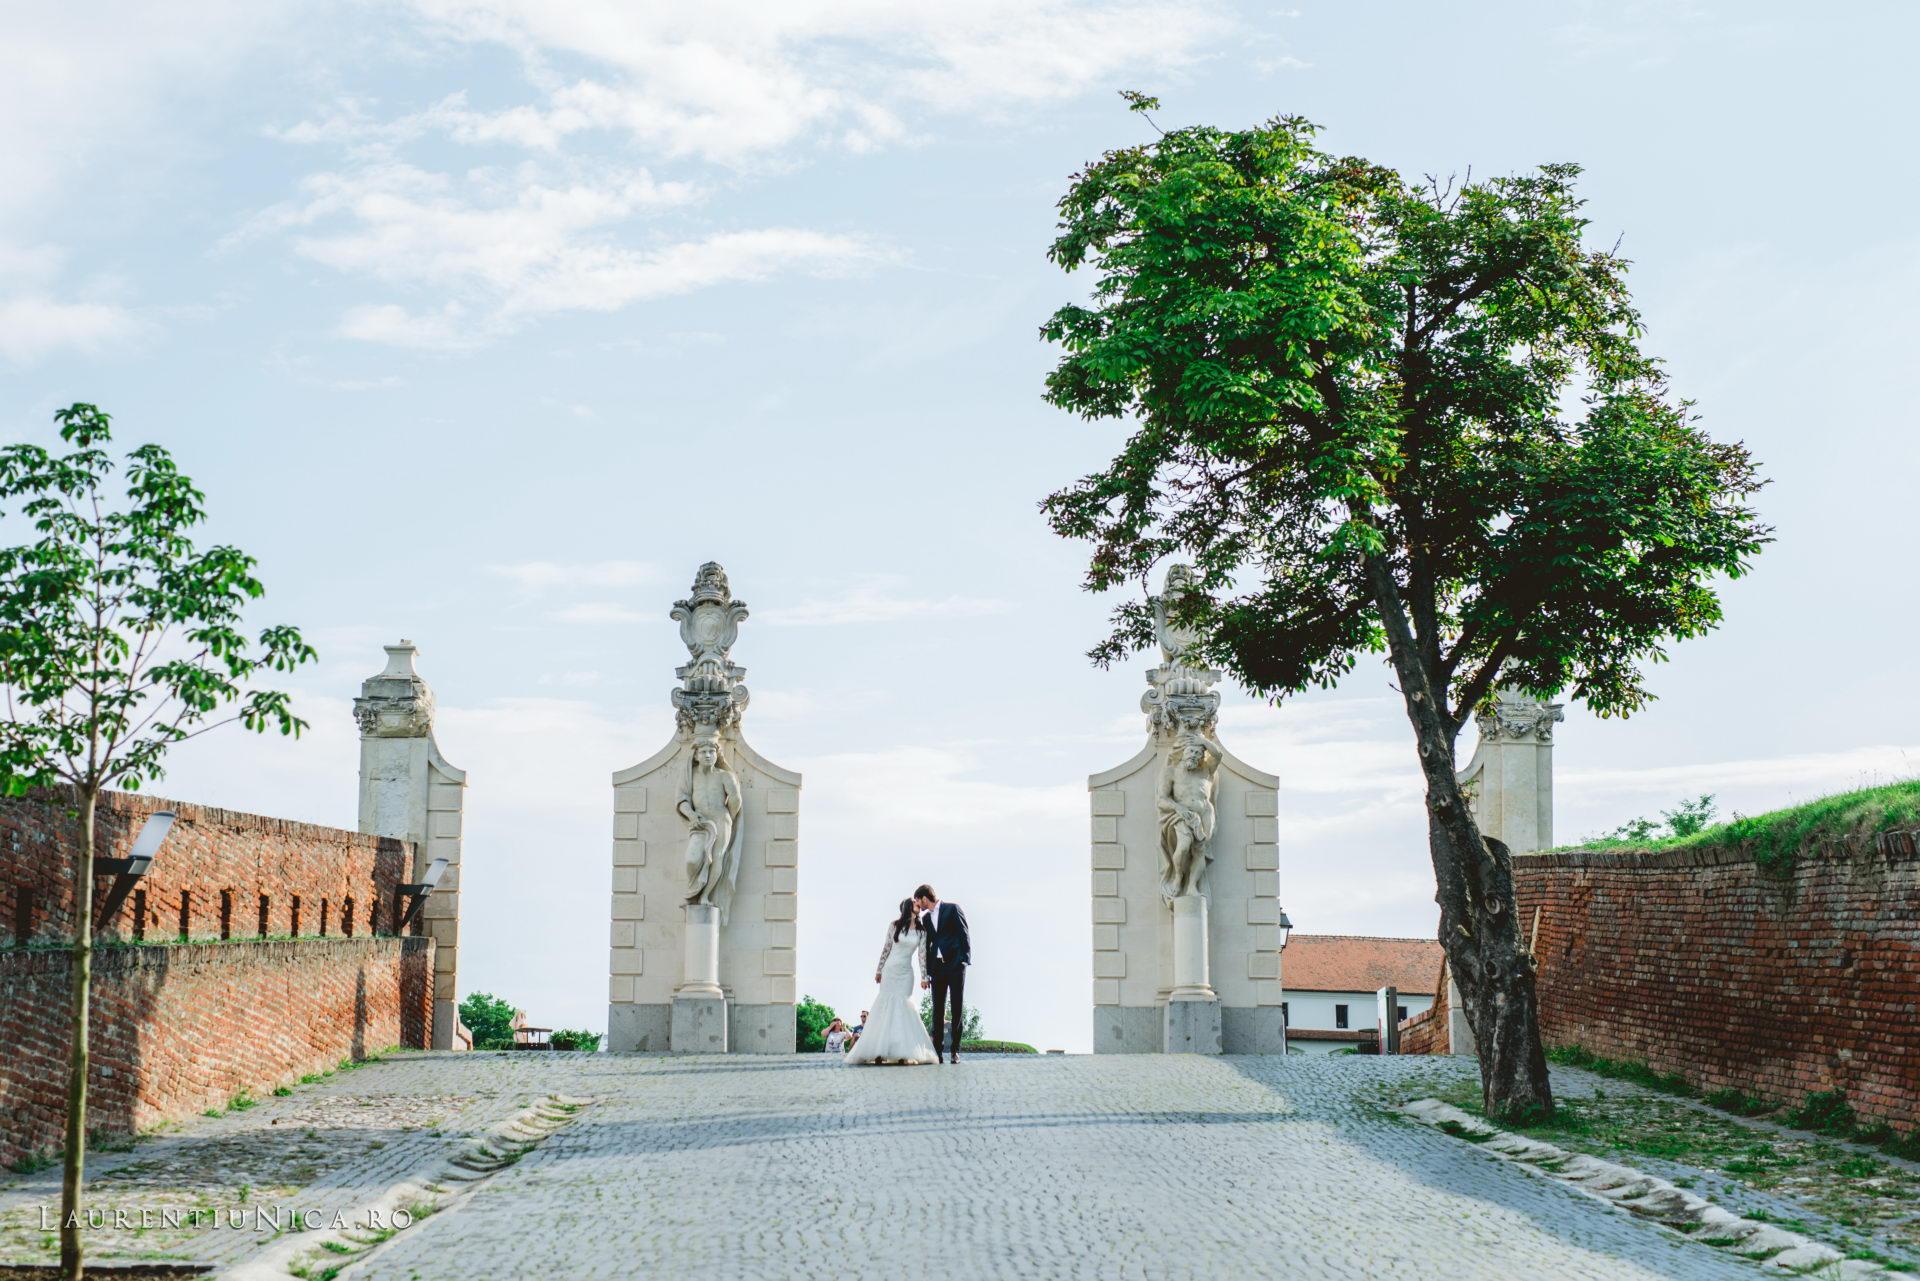 cristina_si_ovidiu-after-wedding-alba-iulia_fotograf_laurentiu_nica_69